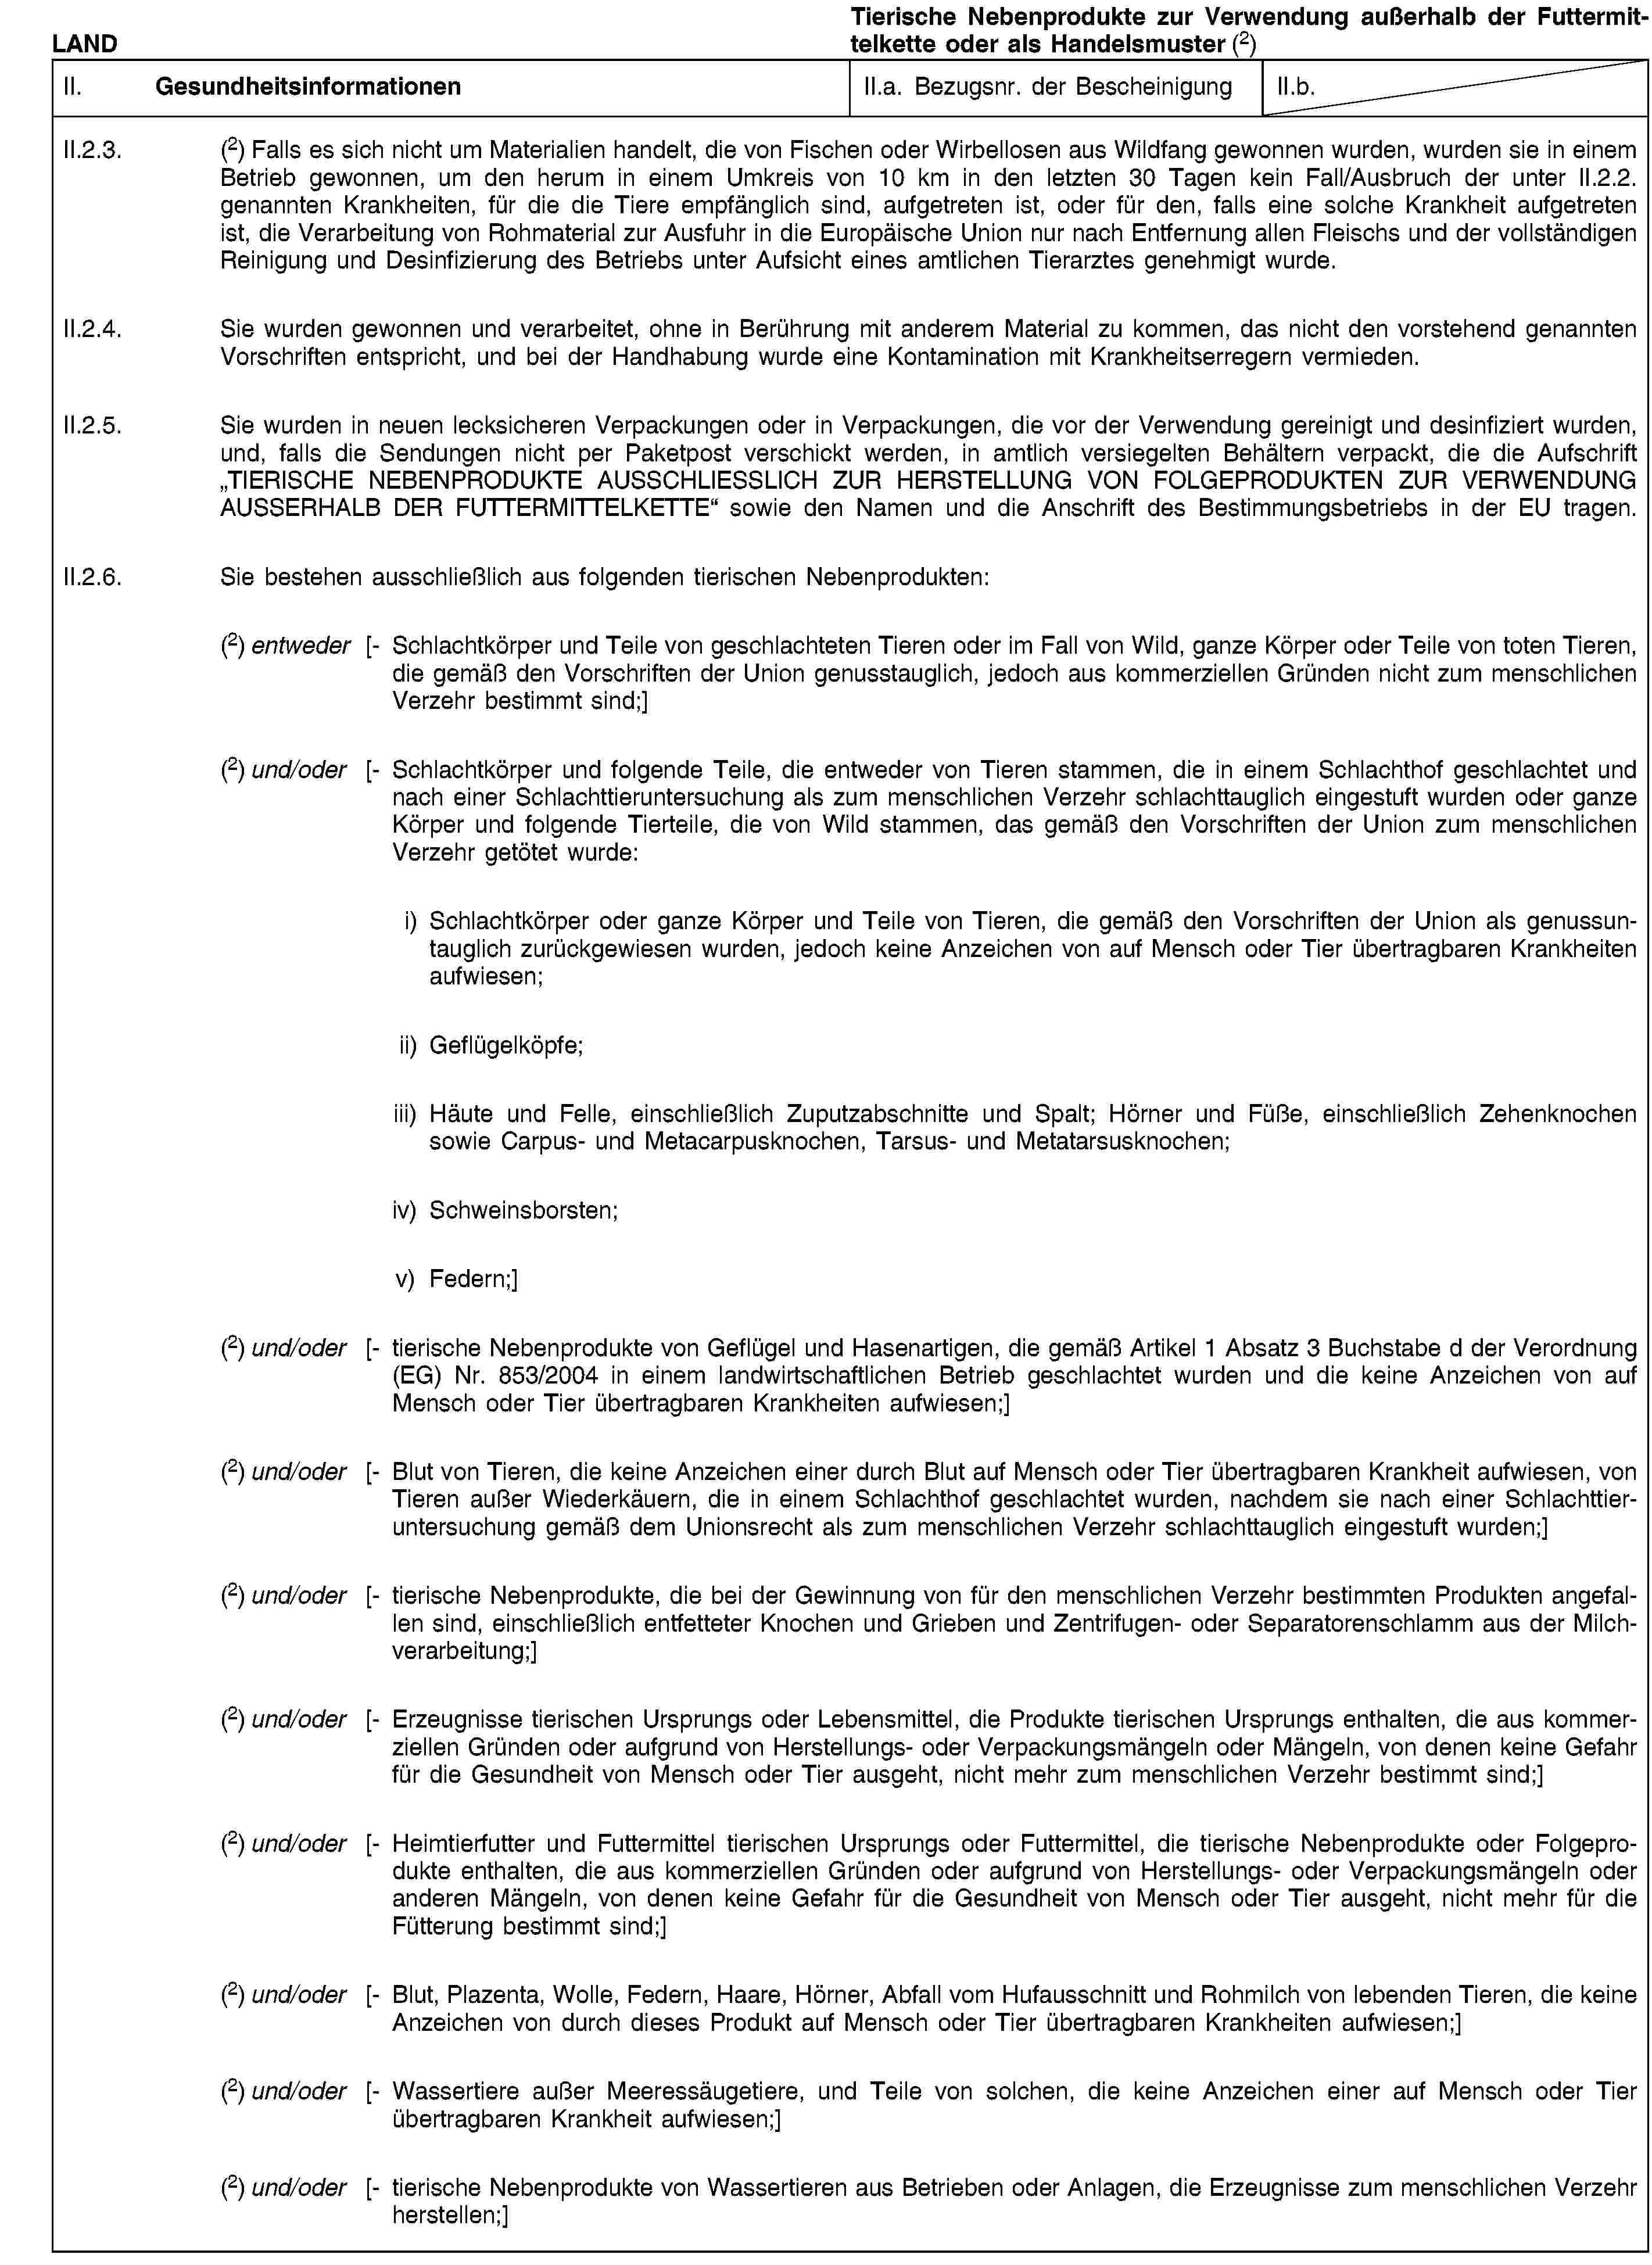 EUR-Lex - 02011R0142-20131201 - EN - EUR-Lex